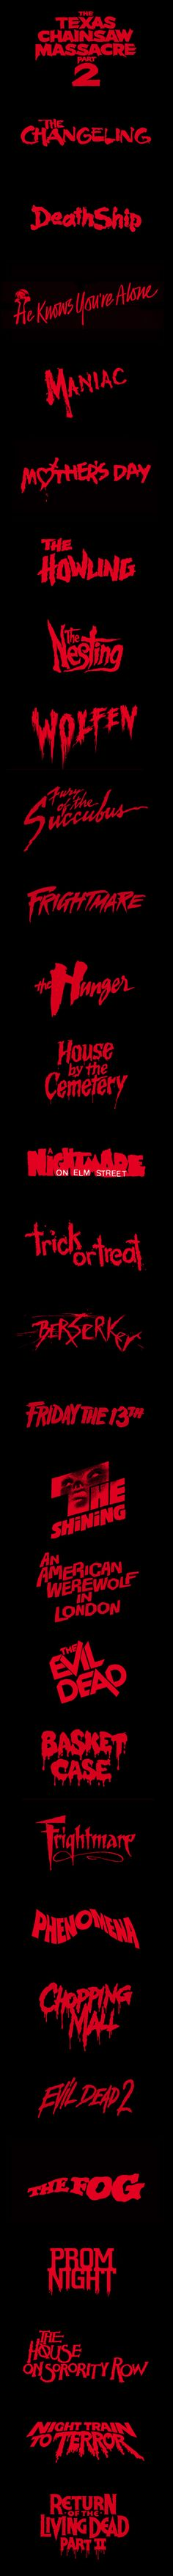 1980's Horror Logos